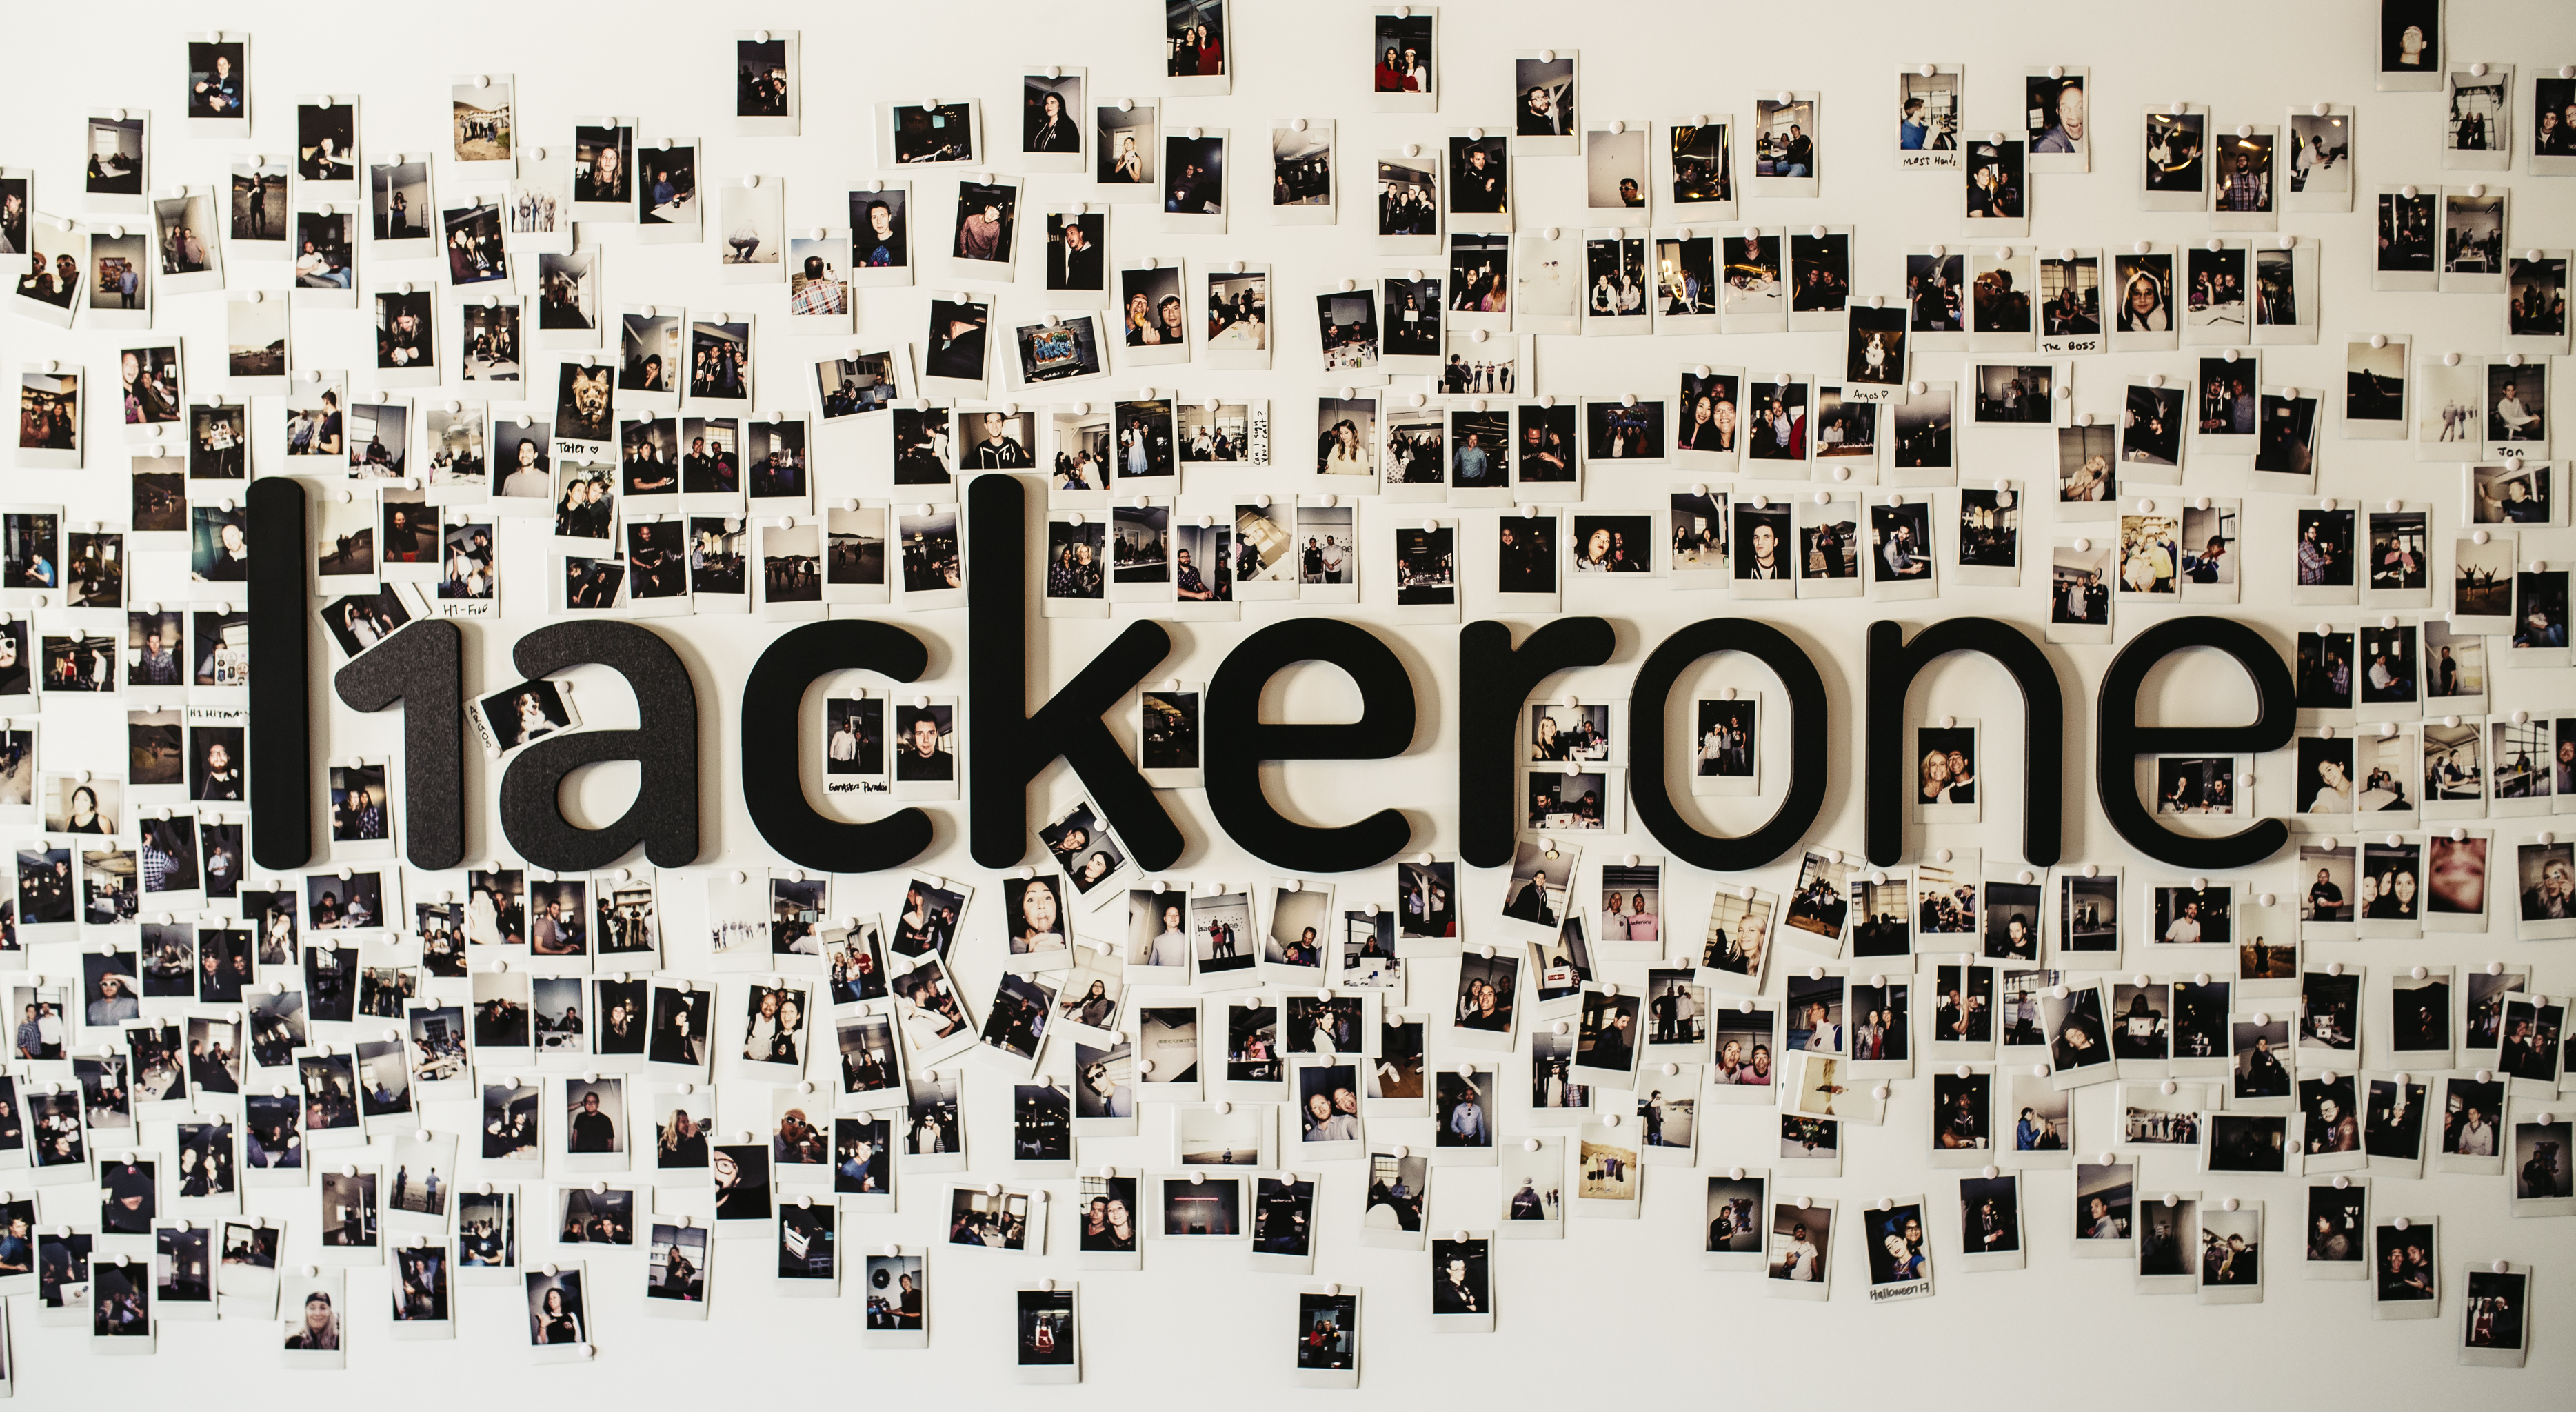 O que a Juneteenth significa no HackerOne